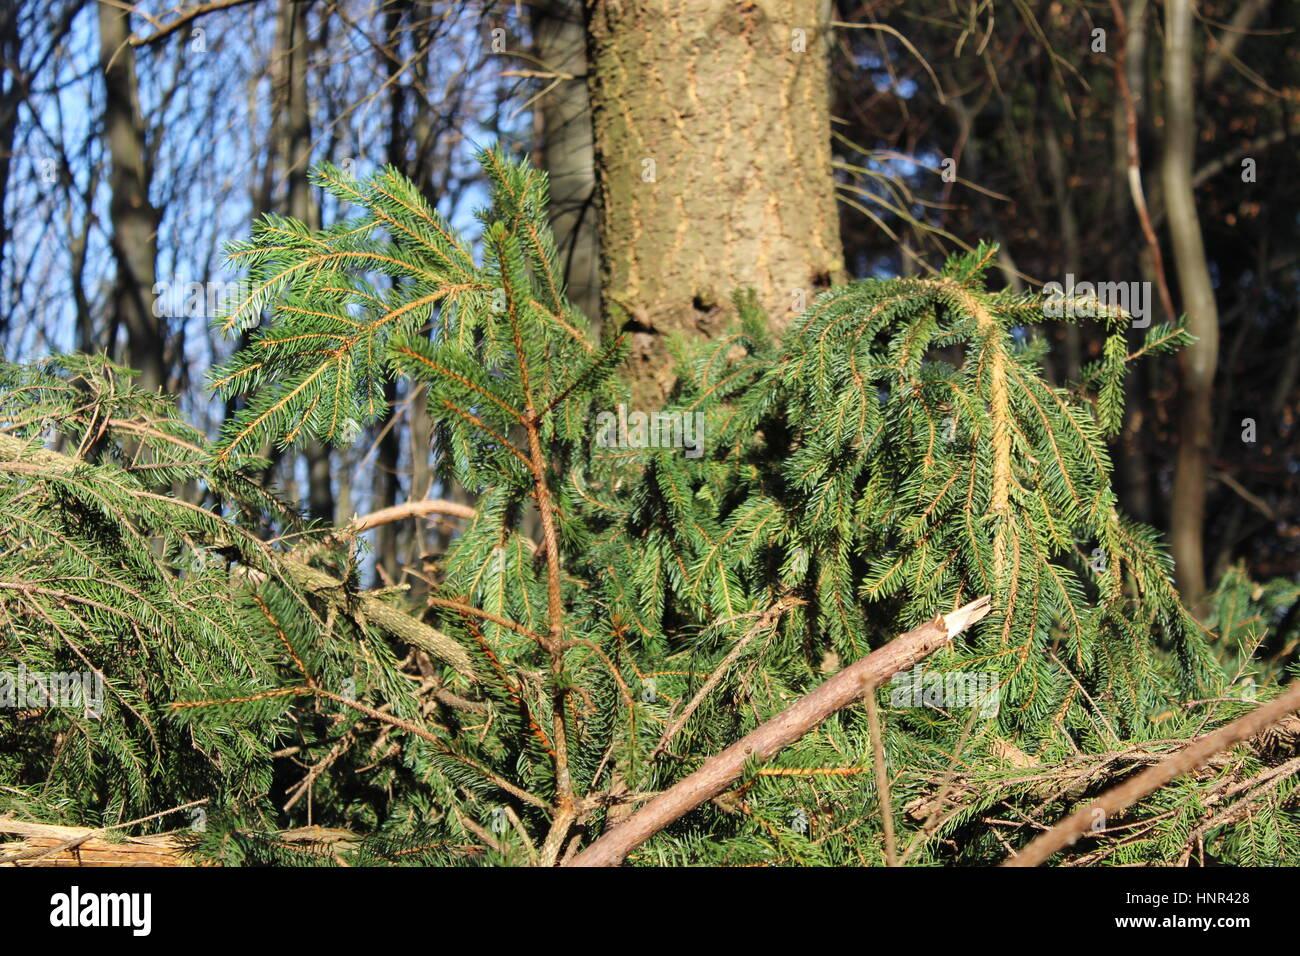 Felled conifer - Stock Image